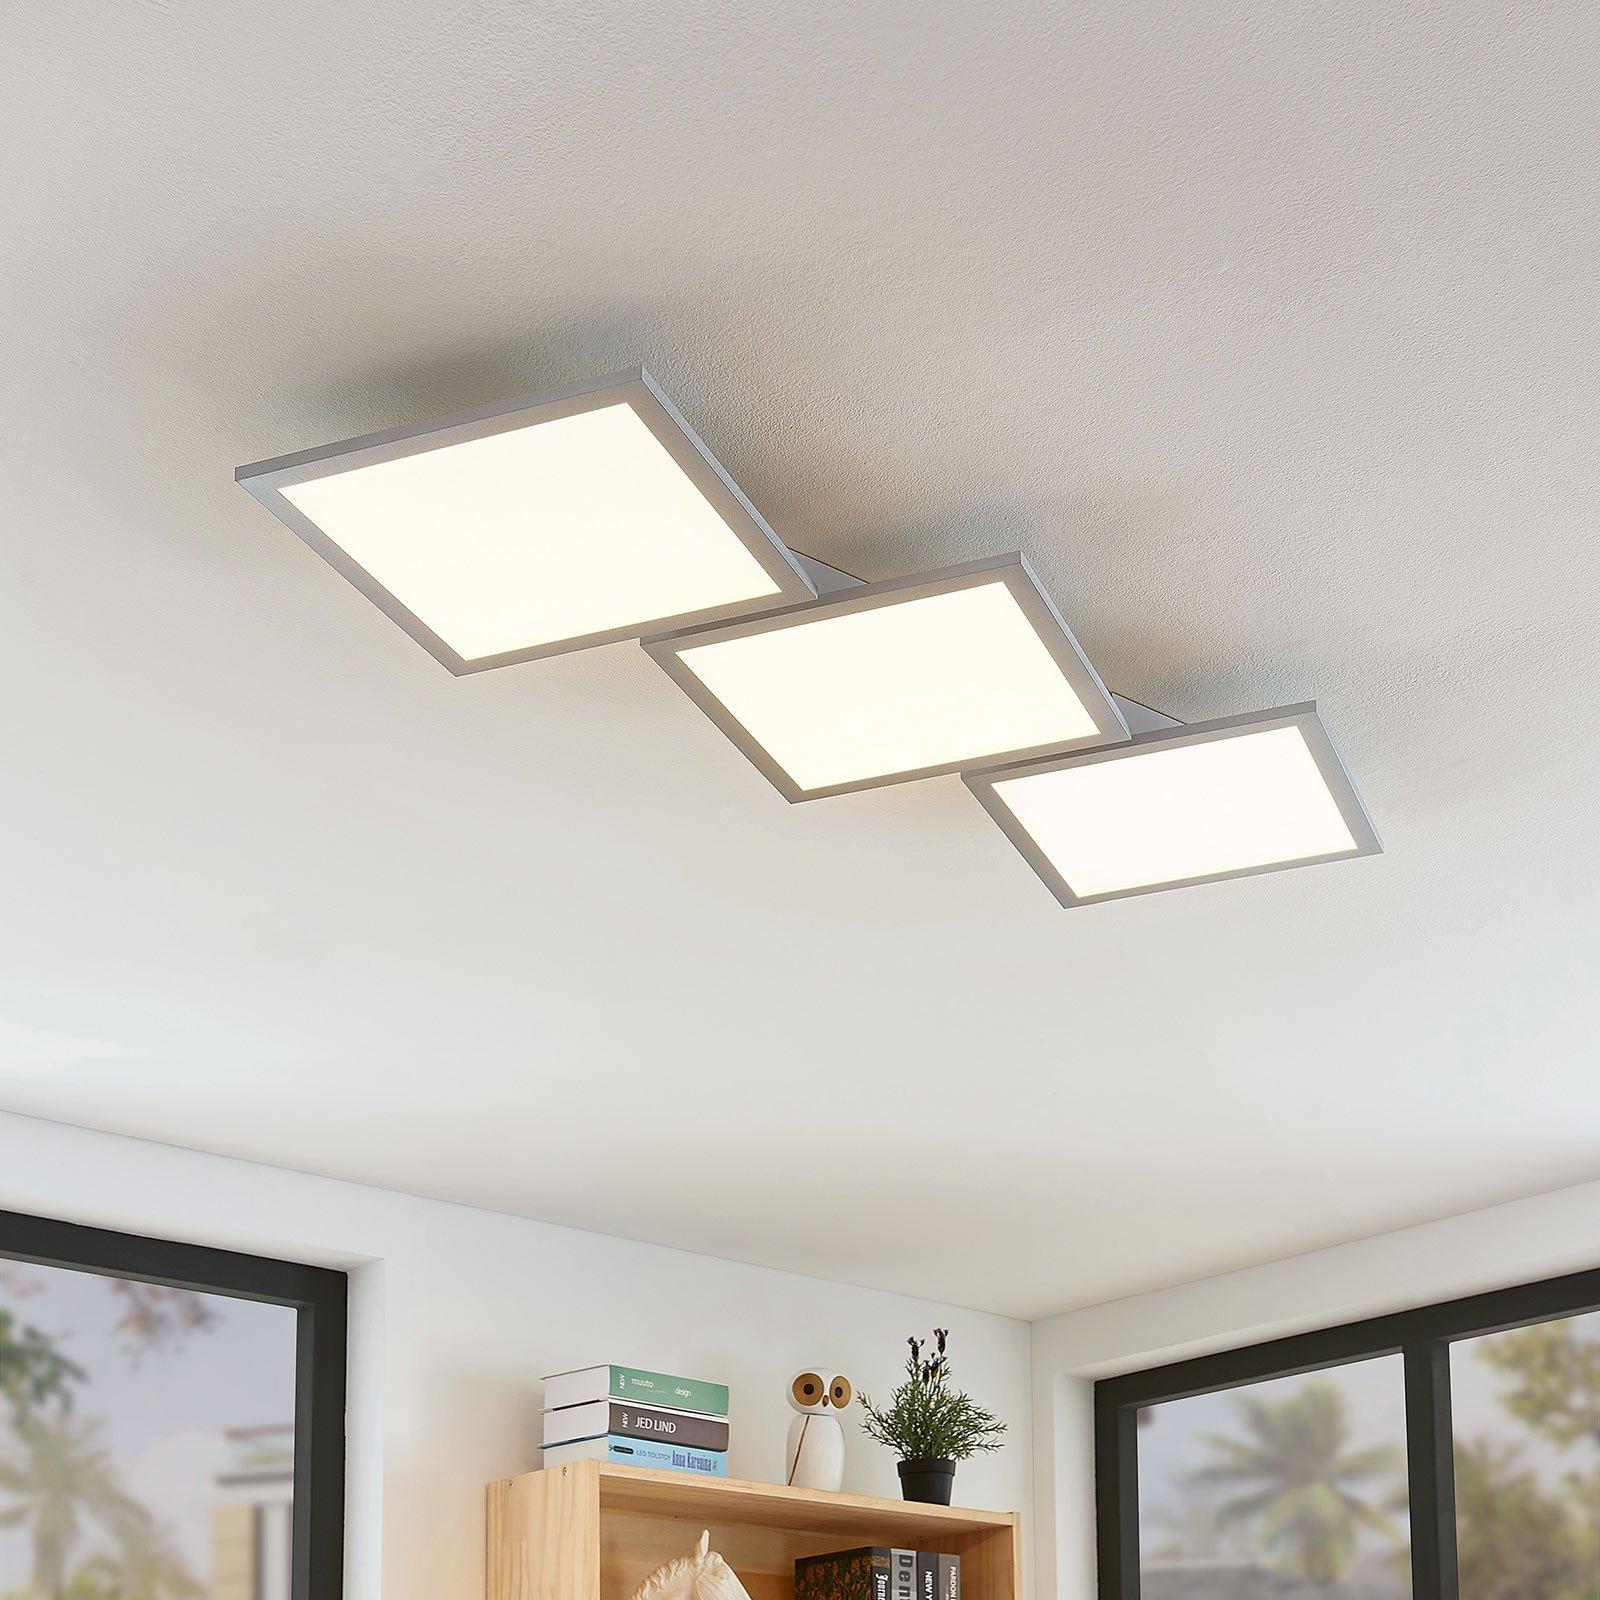 LED-taklampe Ilira, dimbar, CCT, 3 lyskilder